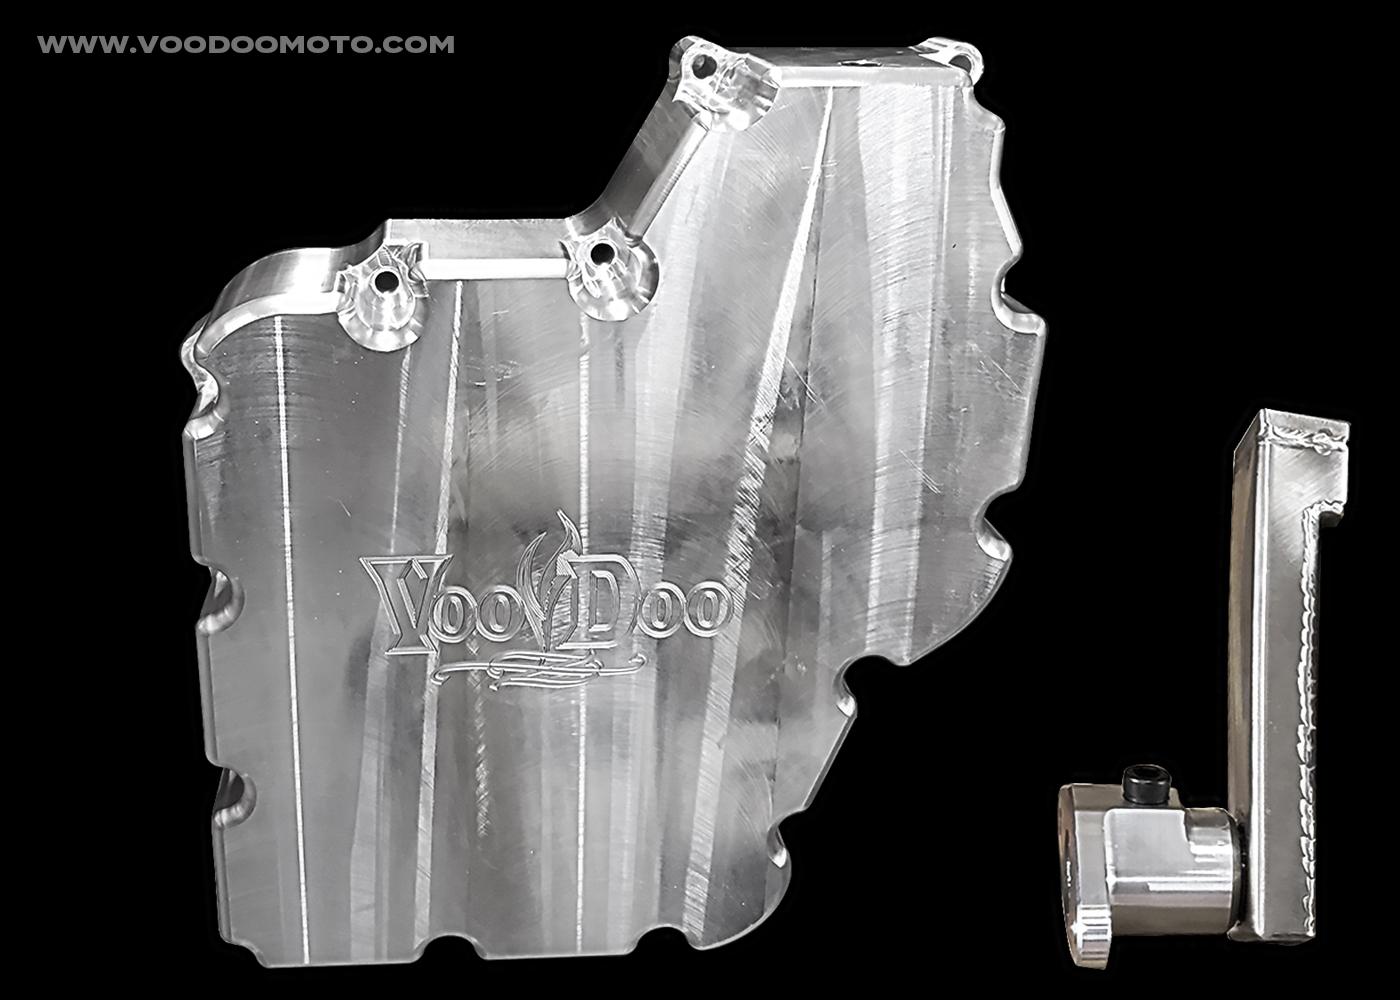 Voodoo Custom Motorcycle Components: Hayabusa Oil Pans